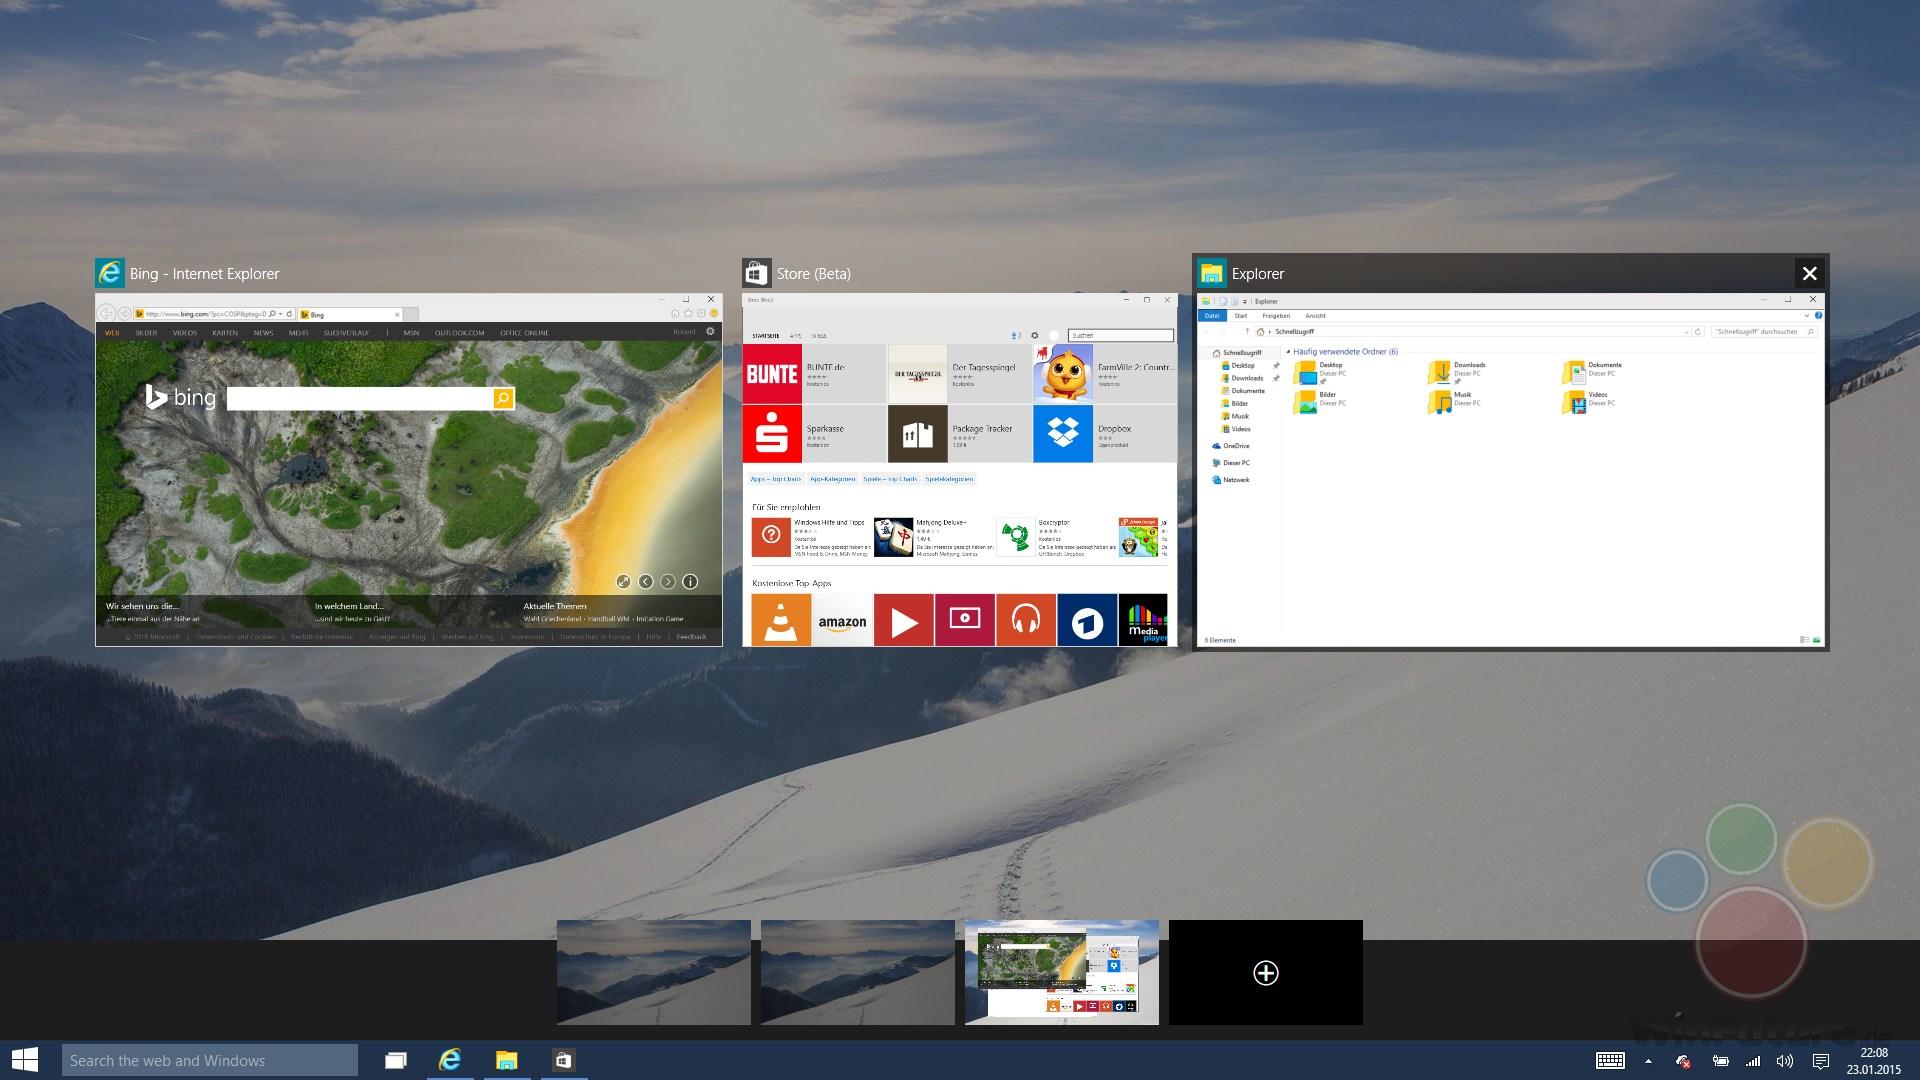 Windows 10 Build 9926